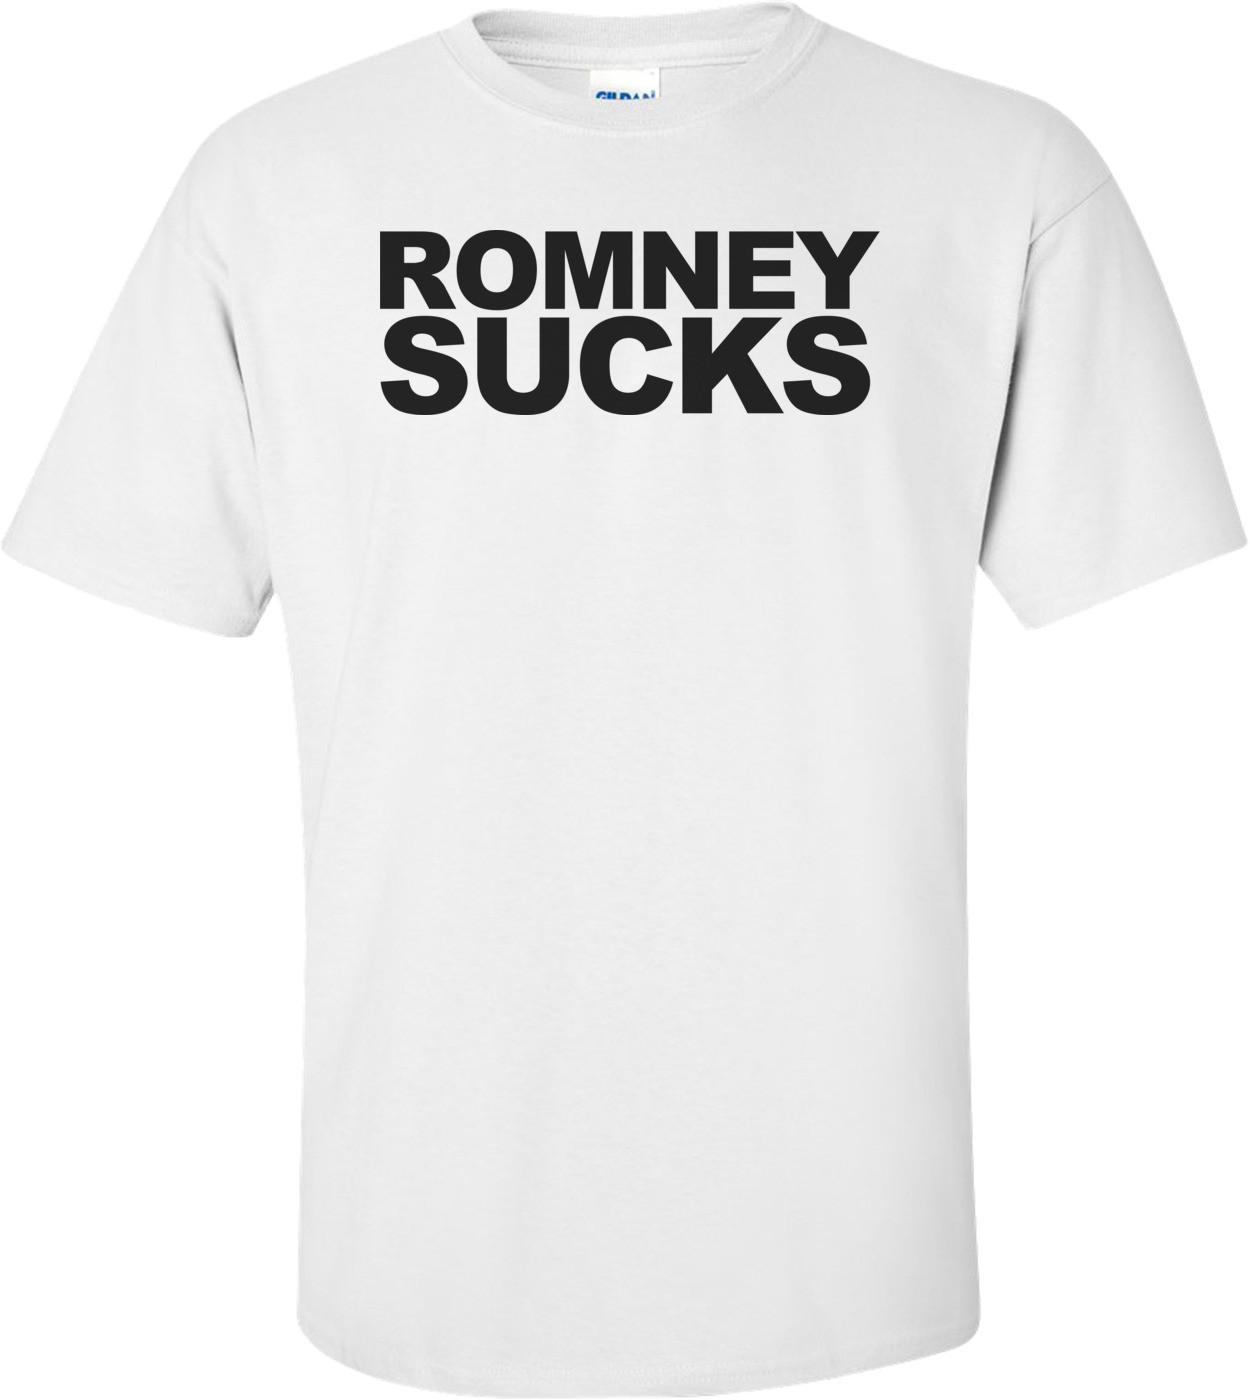 Romney Sucks - Anti Mitt Romney Shirt